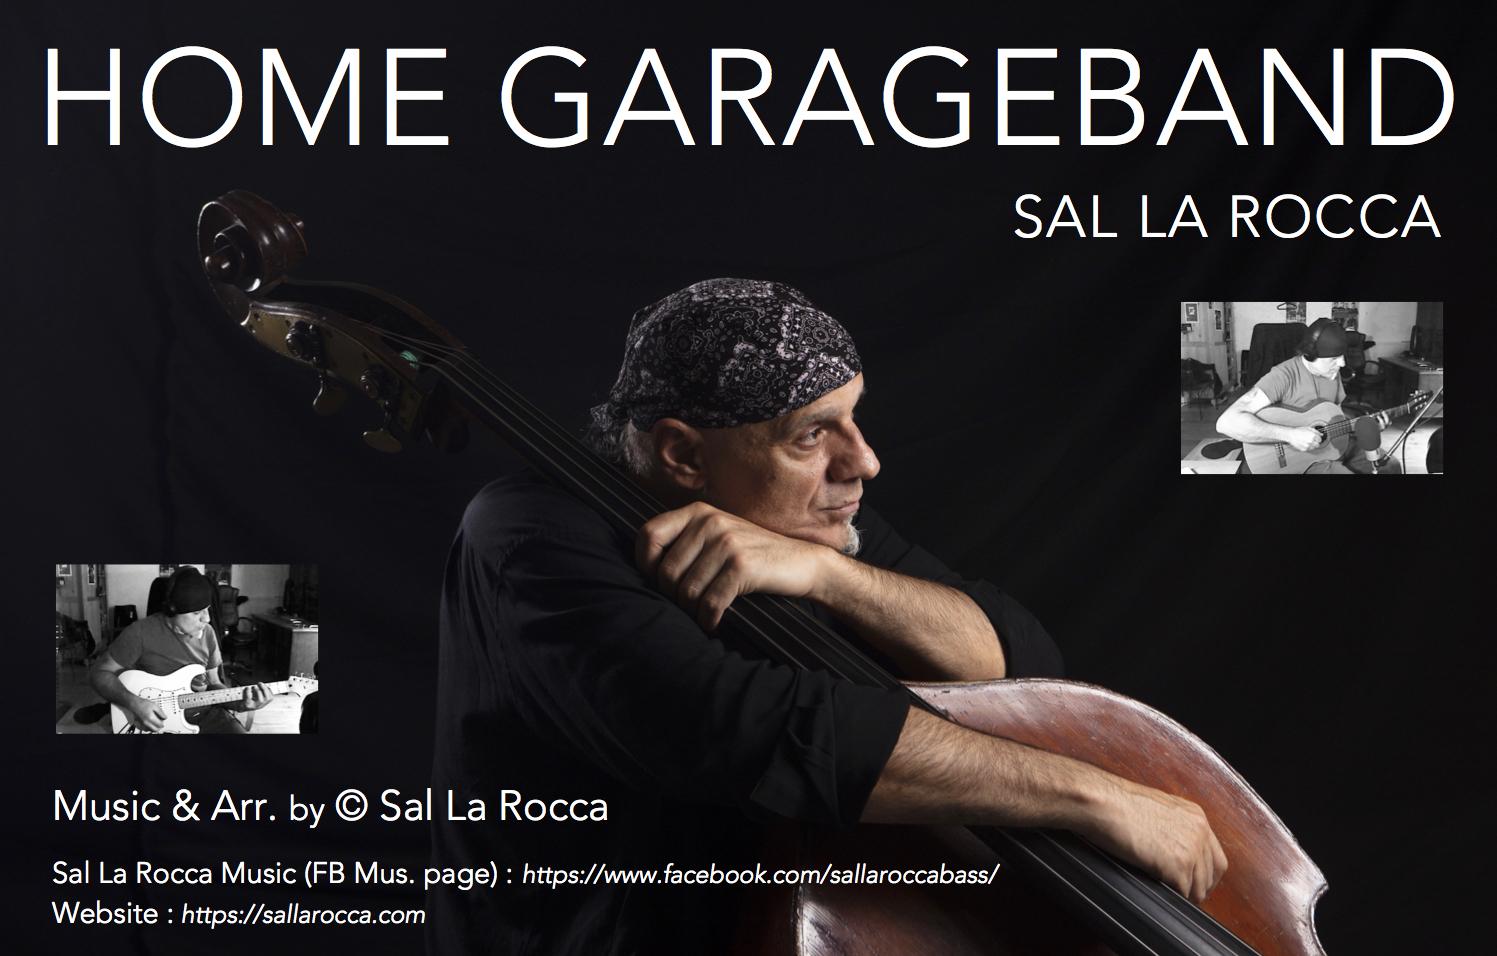 Home Garageband Sal La Rocca